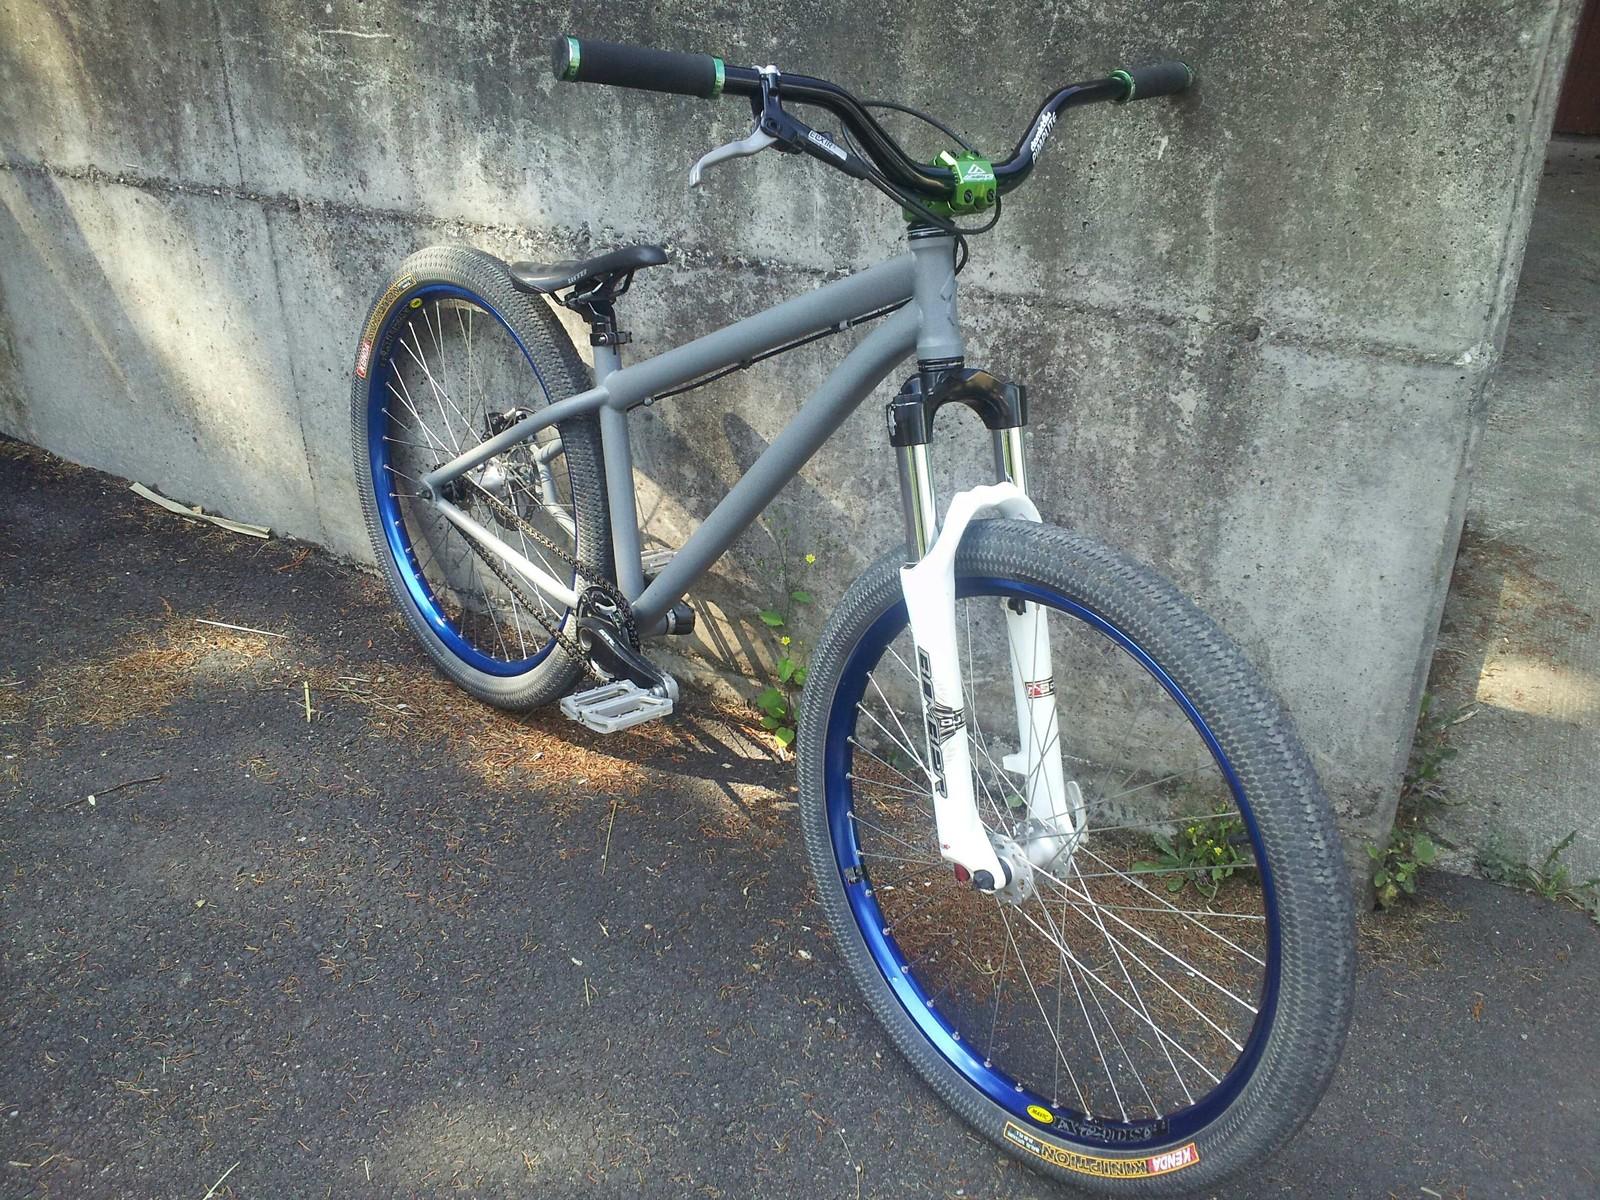 2013-08-20 11 48 56 - millsr4 - Mountain Biking Pictures - Vital MTB